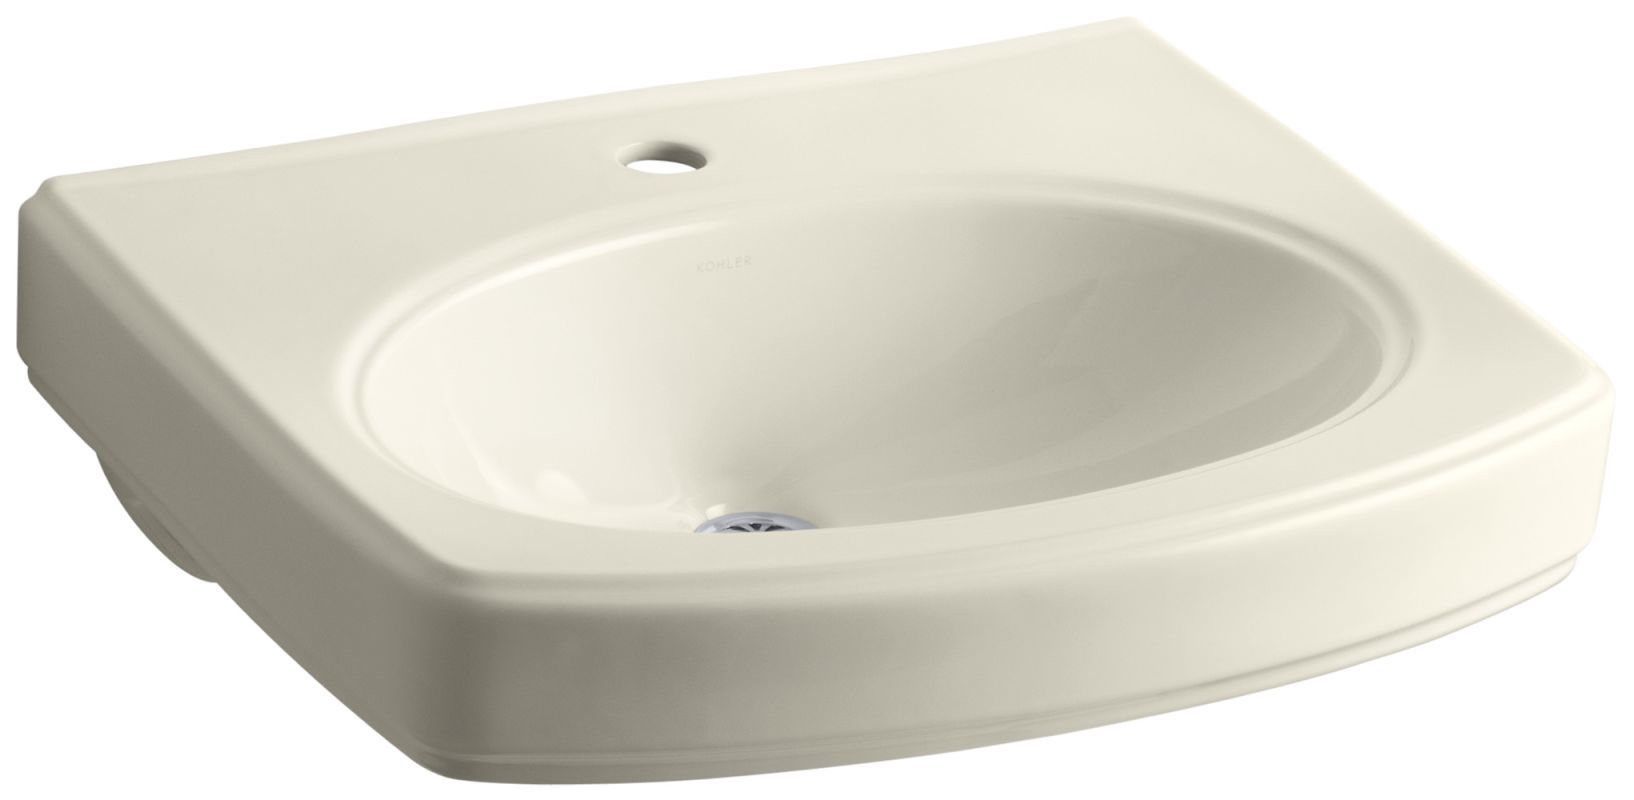 kohler k 2028 1 products wall mounted bathroom sinks sink faucet rh pinterest com